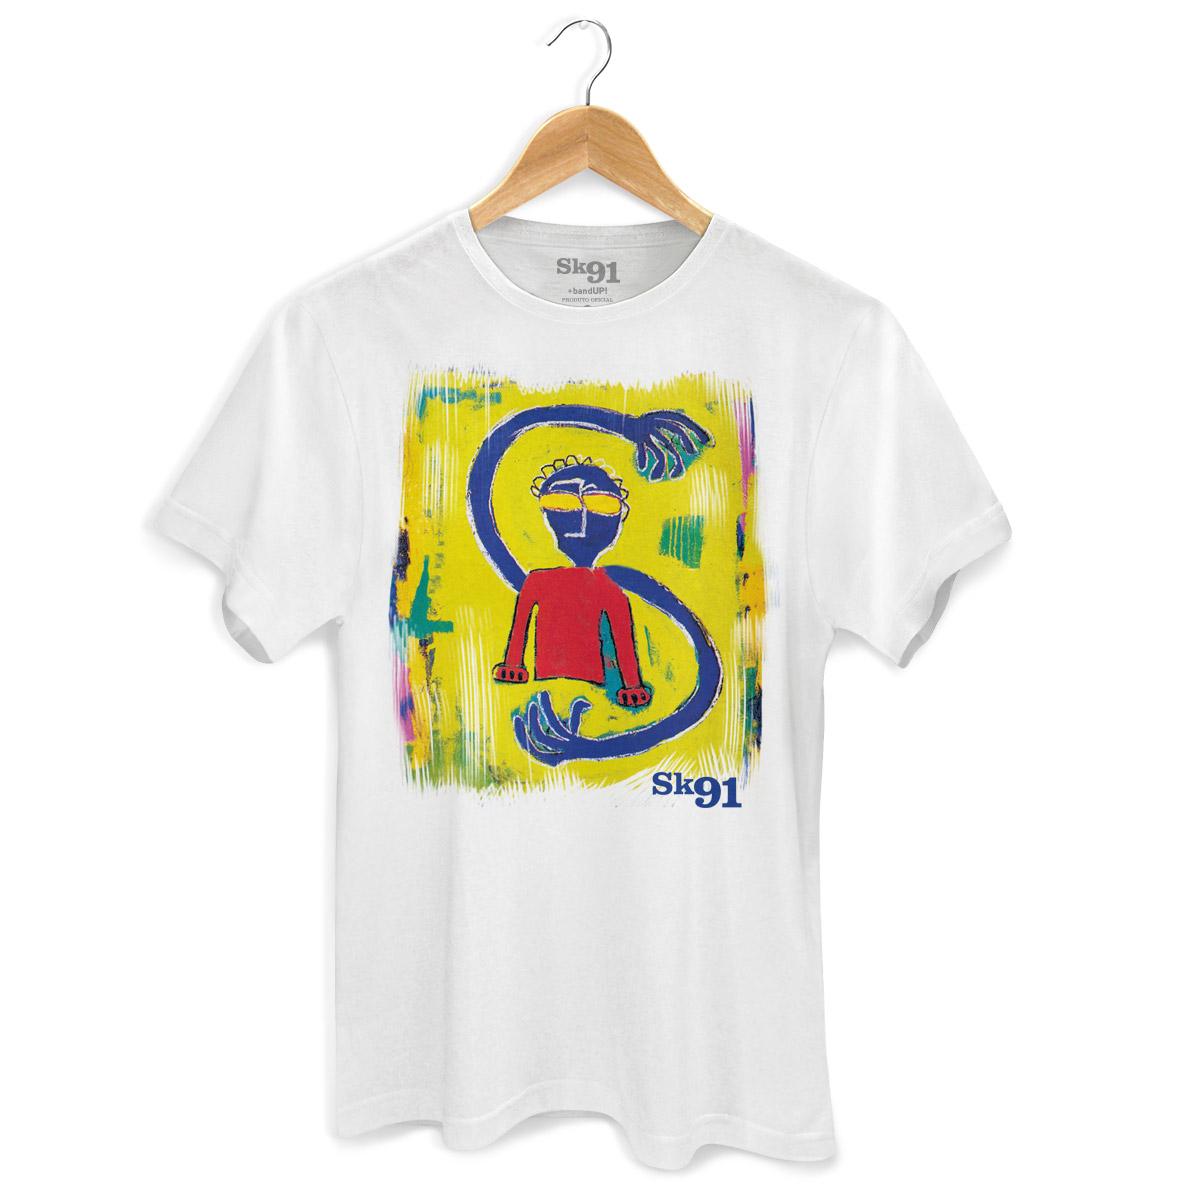 Camiseta Masculina SK91 Siderado